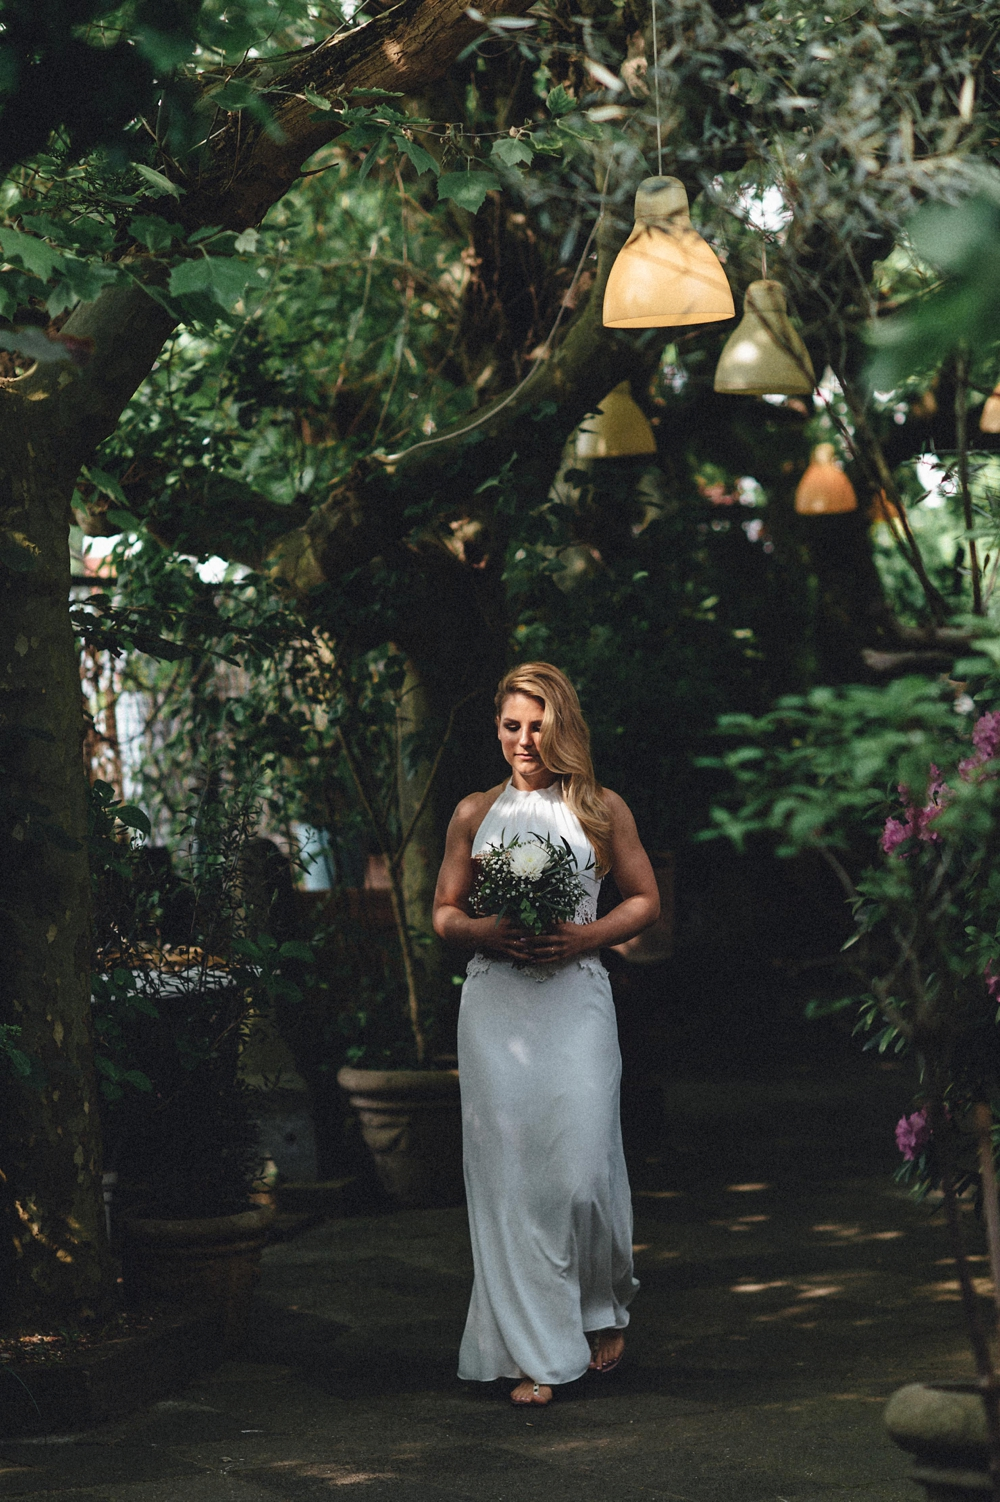 bohemian-emotional-wedding-nrw_1277 hochzeitsfotograf düsseldorfAnnie & Kazu emotionale Hochzeit in Düsseldorfbohemian emotional wedding nrw 1277